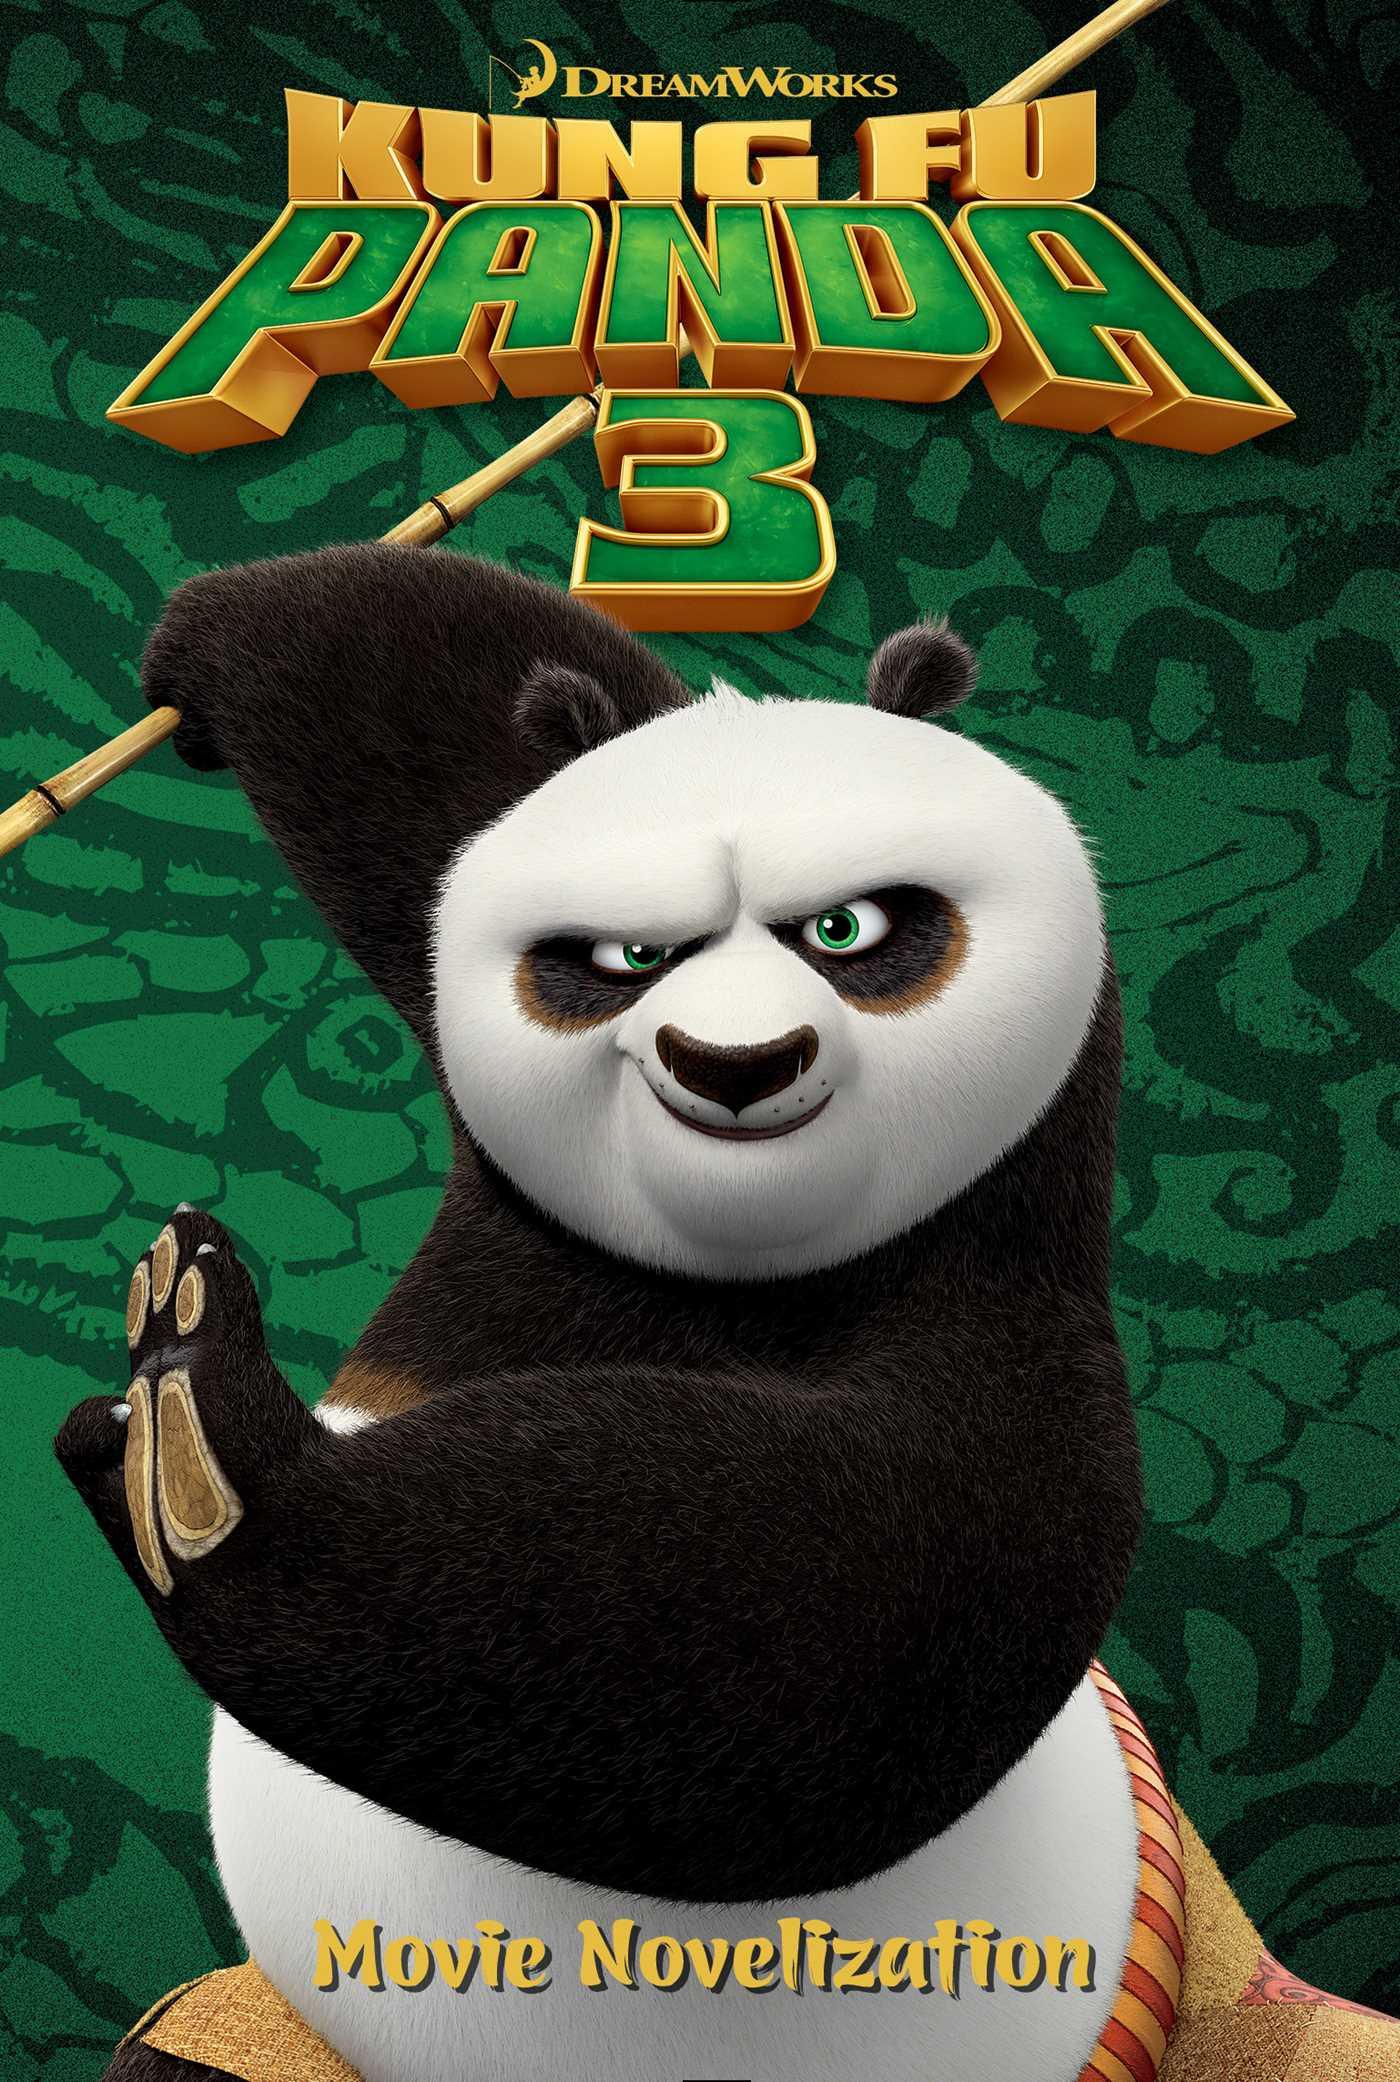 kung fu panda 3 movie novelization ebooktracey west | official